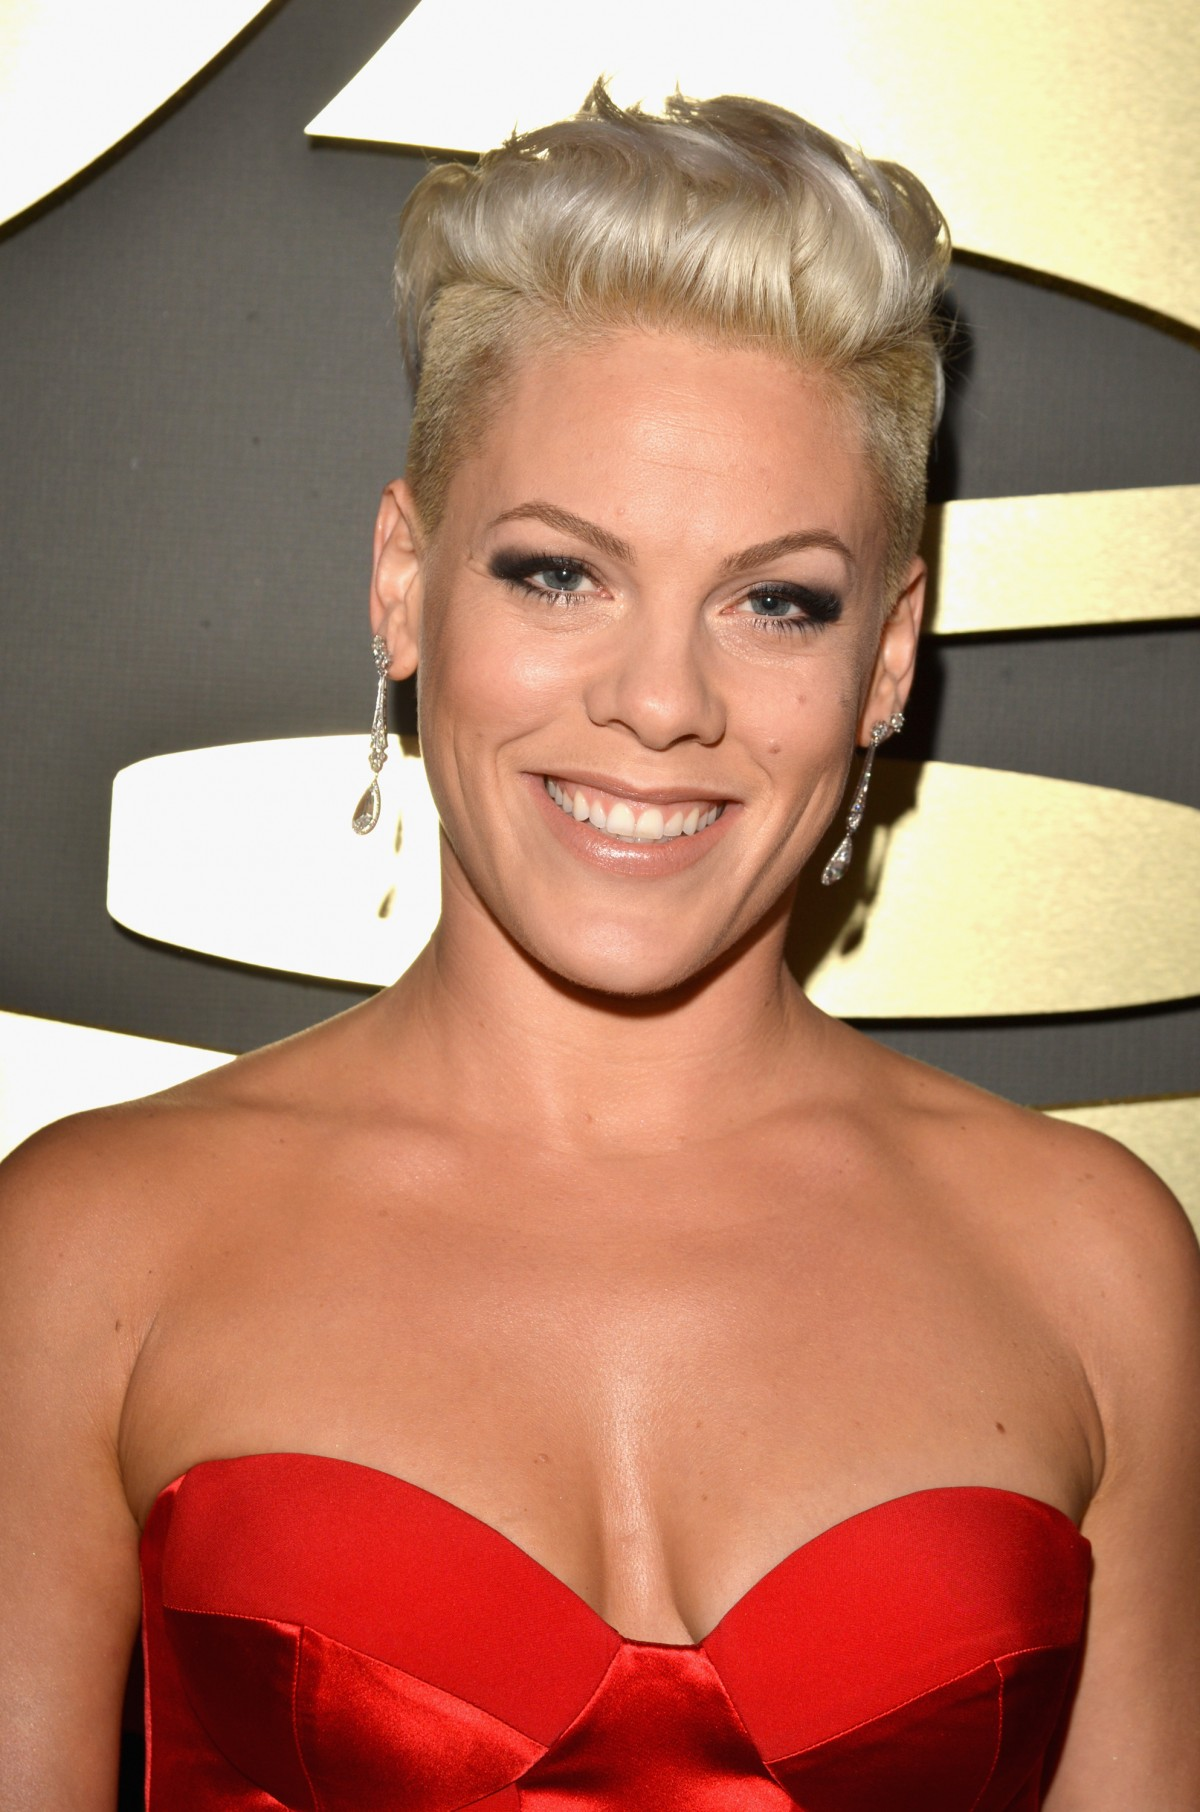 Grammys 2014 Beauty: P!nk's Makeup & Nails